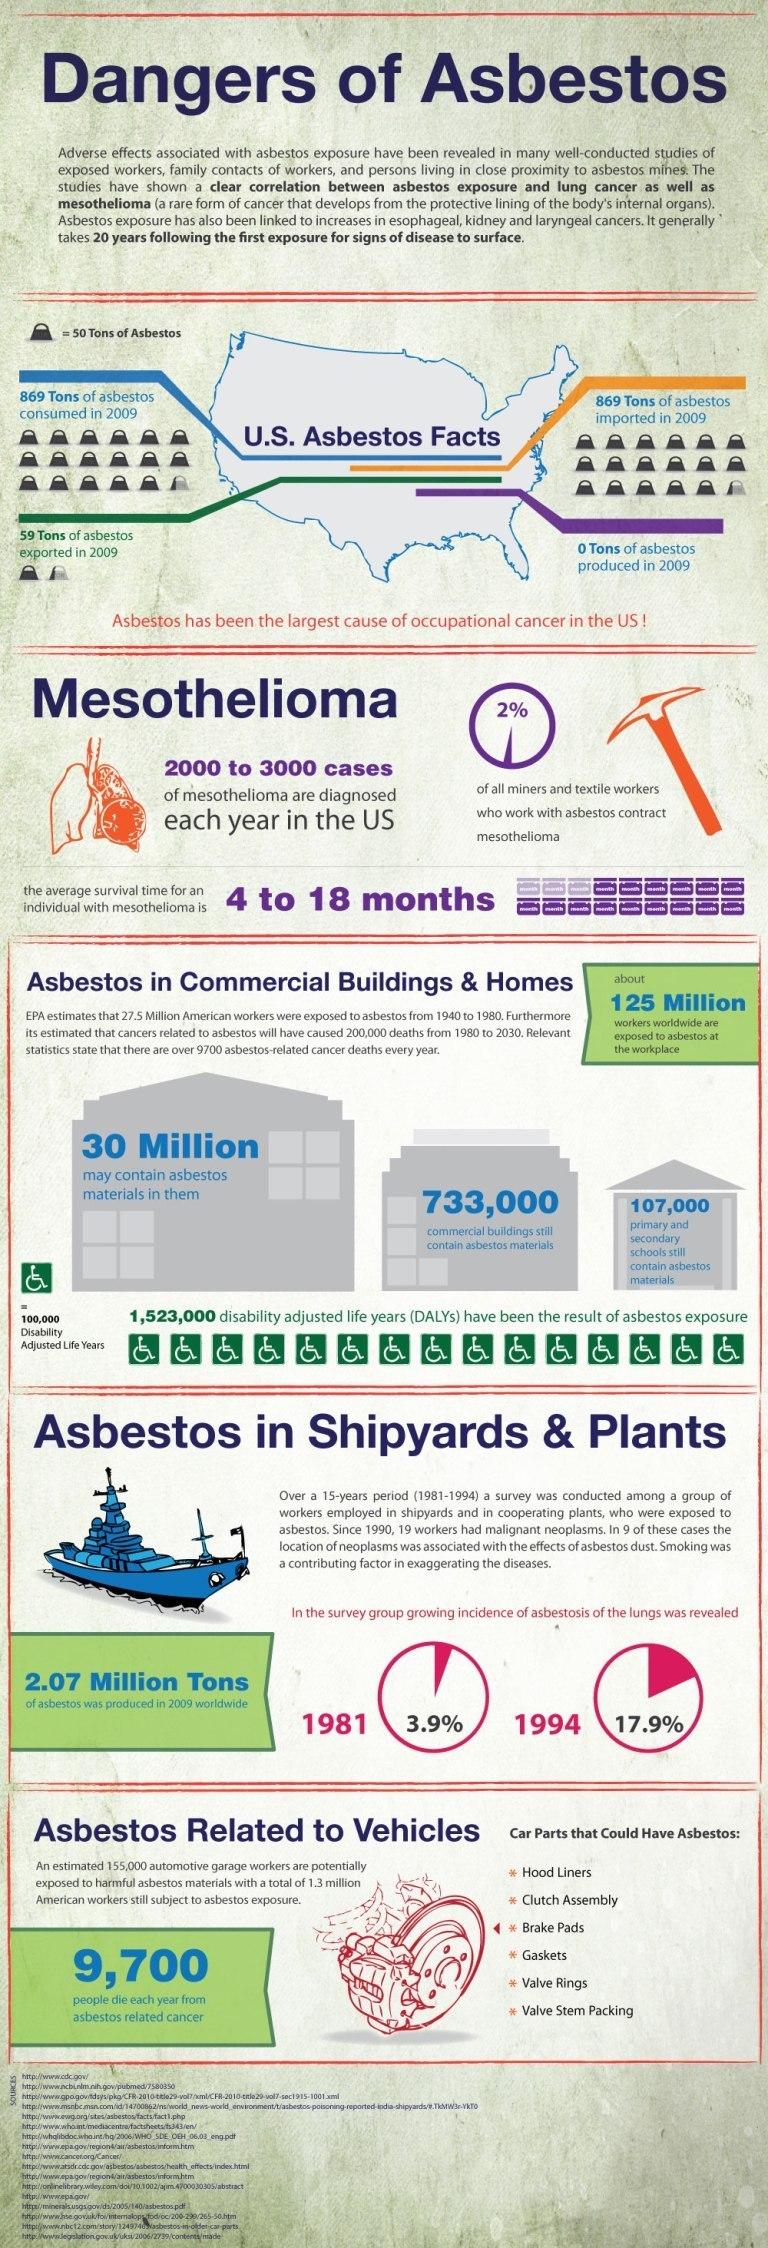 Dangers of Asbestos Summary Infographic